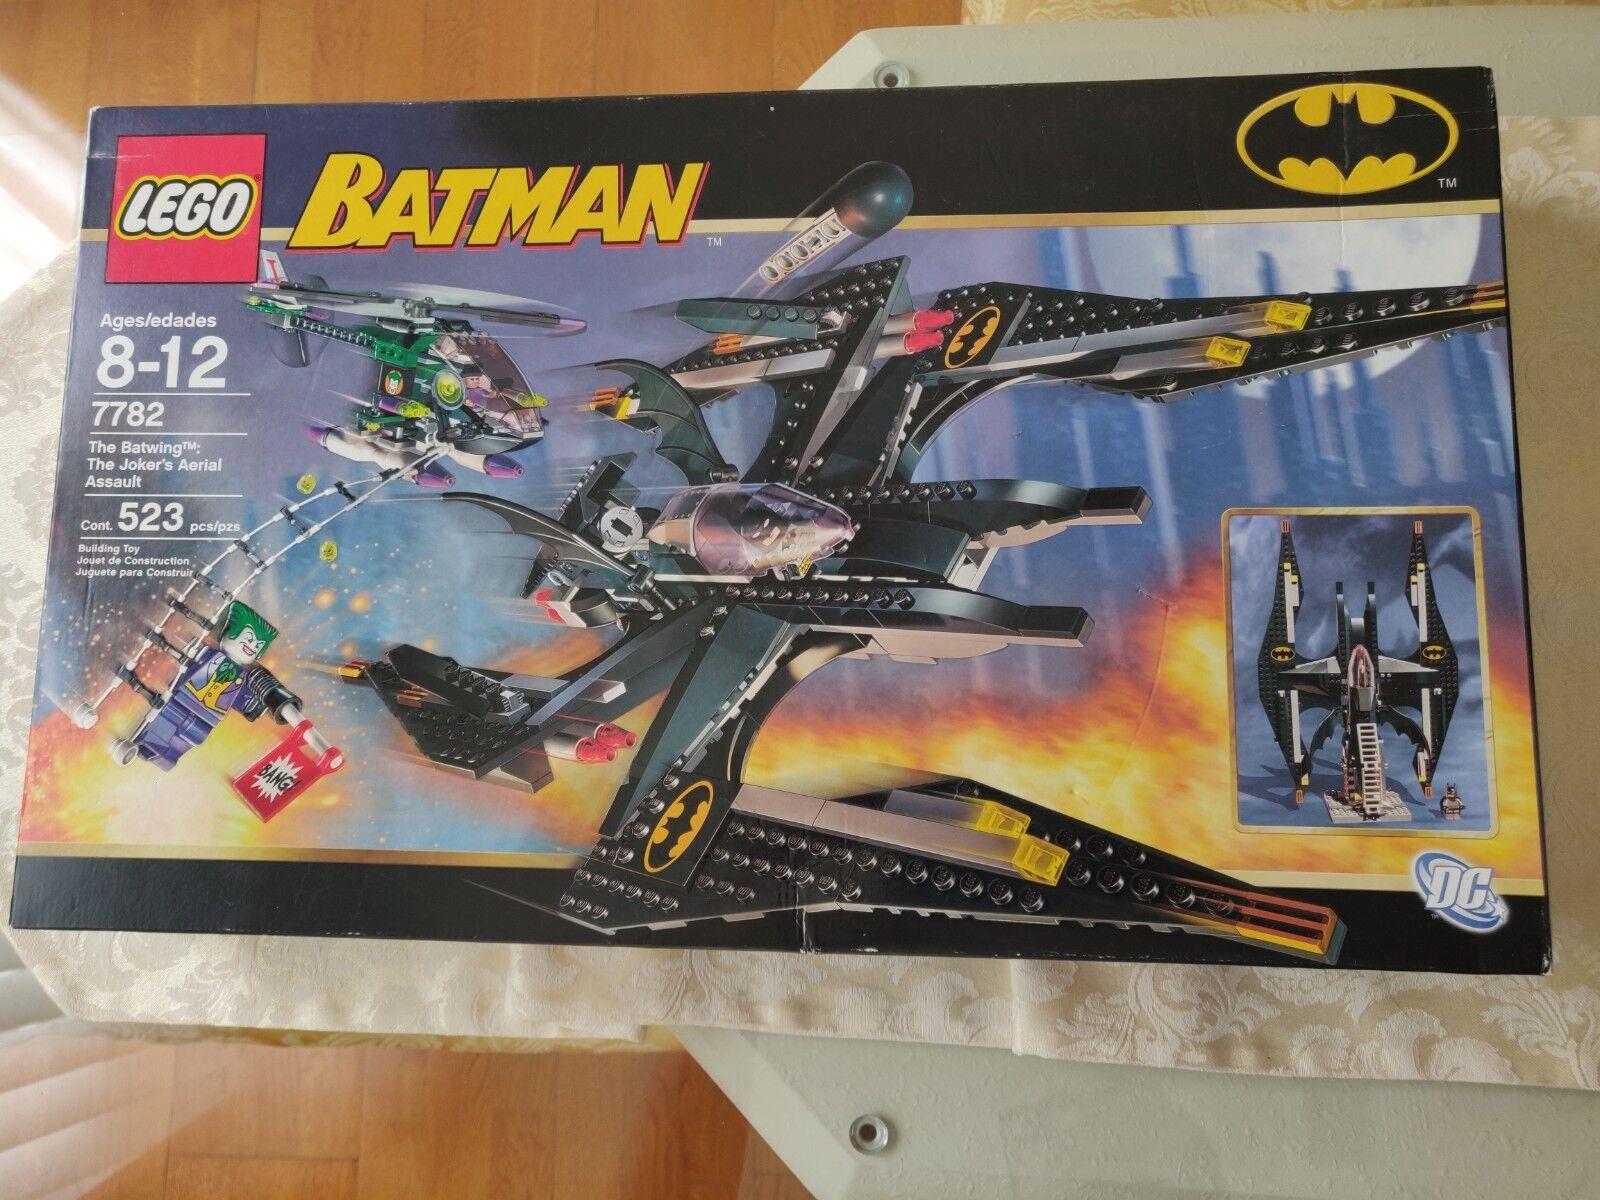 Lego Batman The Batwing: The Joker's Aerial Assault (7782) New SEALED MISB